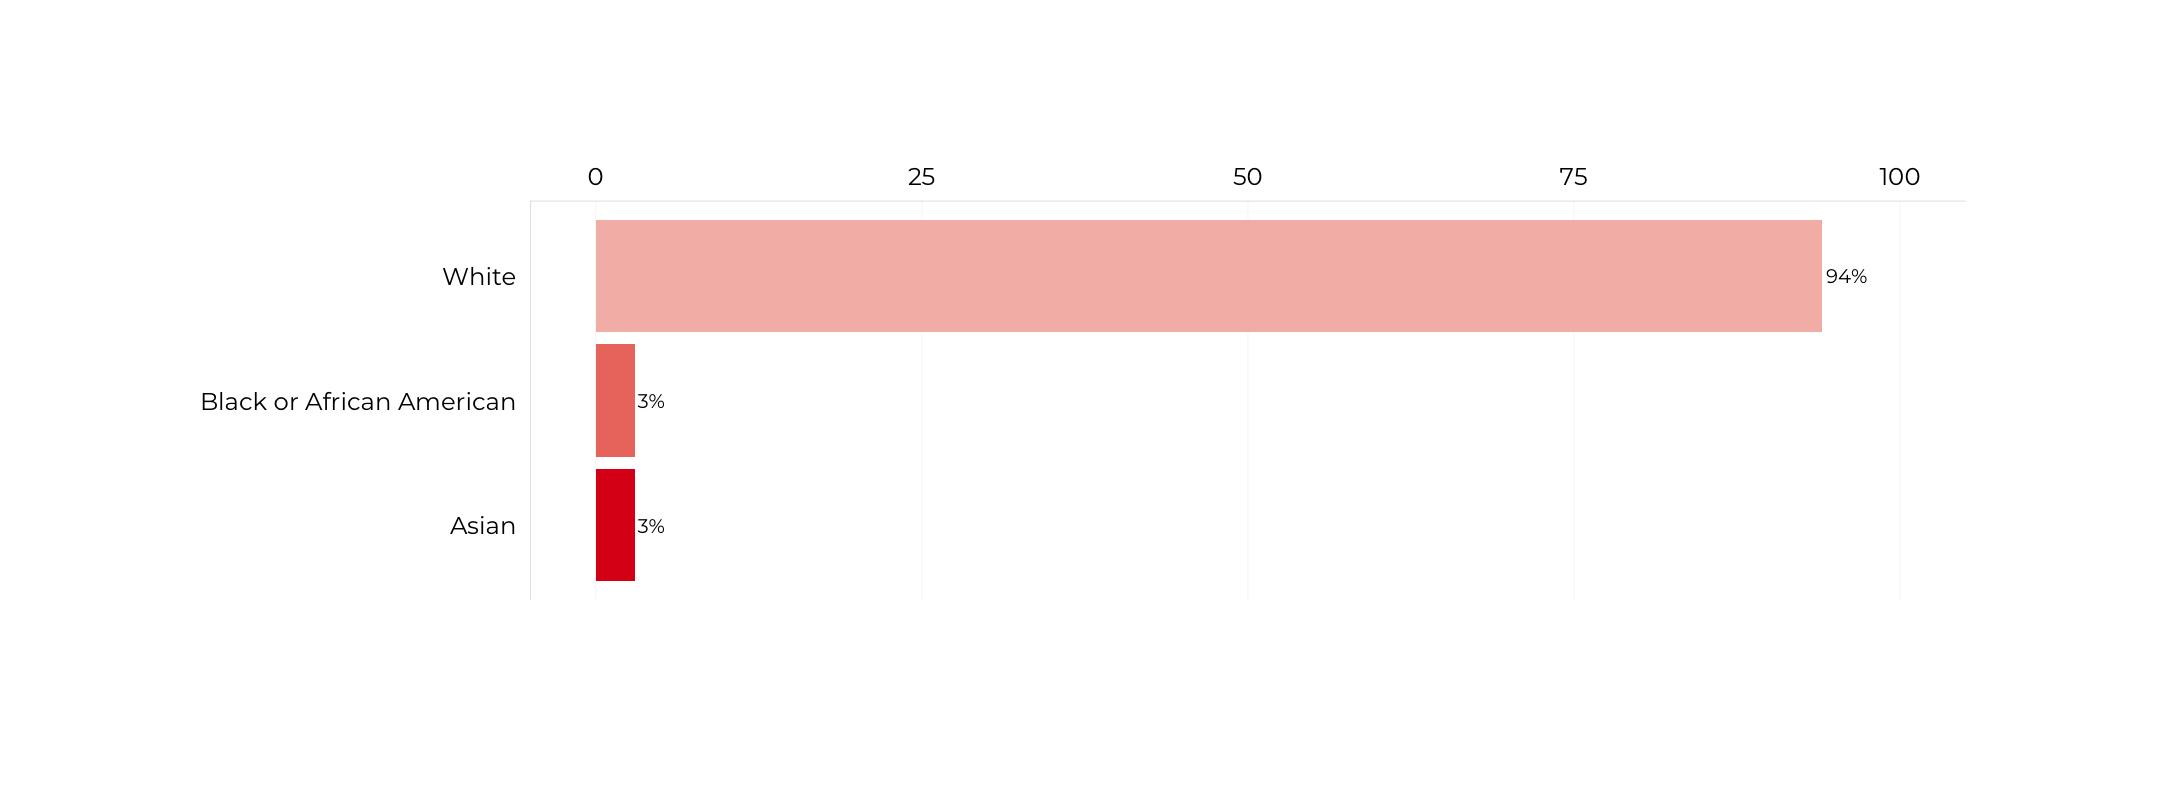 Graph about Racial Composition of Deputy Secretaries of Labor. More detailed text description below.